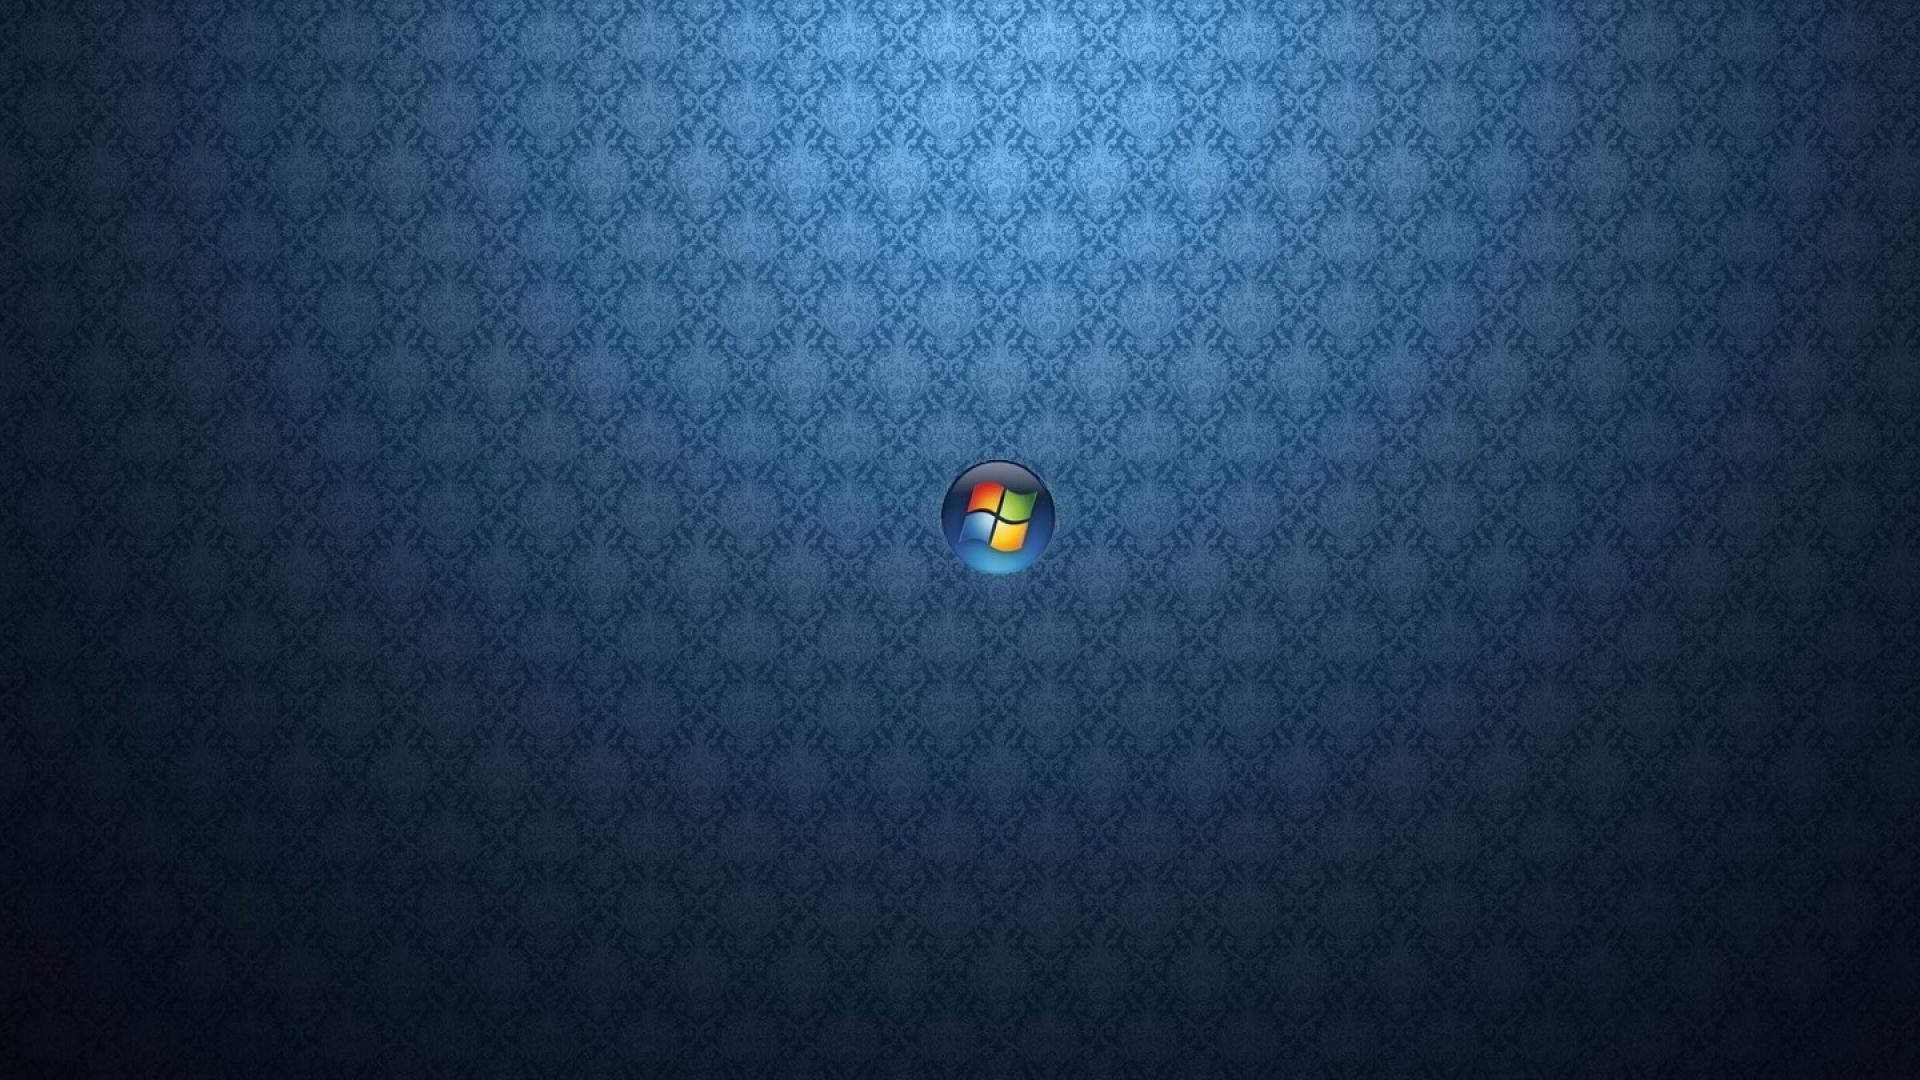 Res: 1920x1080, Windows-Vista-HD-Wallpaper-Galerie-(77-Plus)-PIC-WPW502502